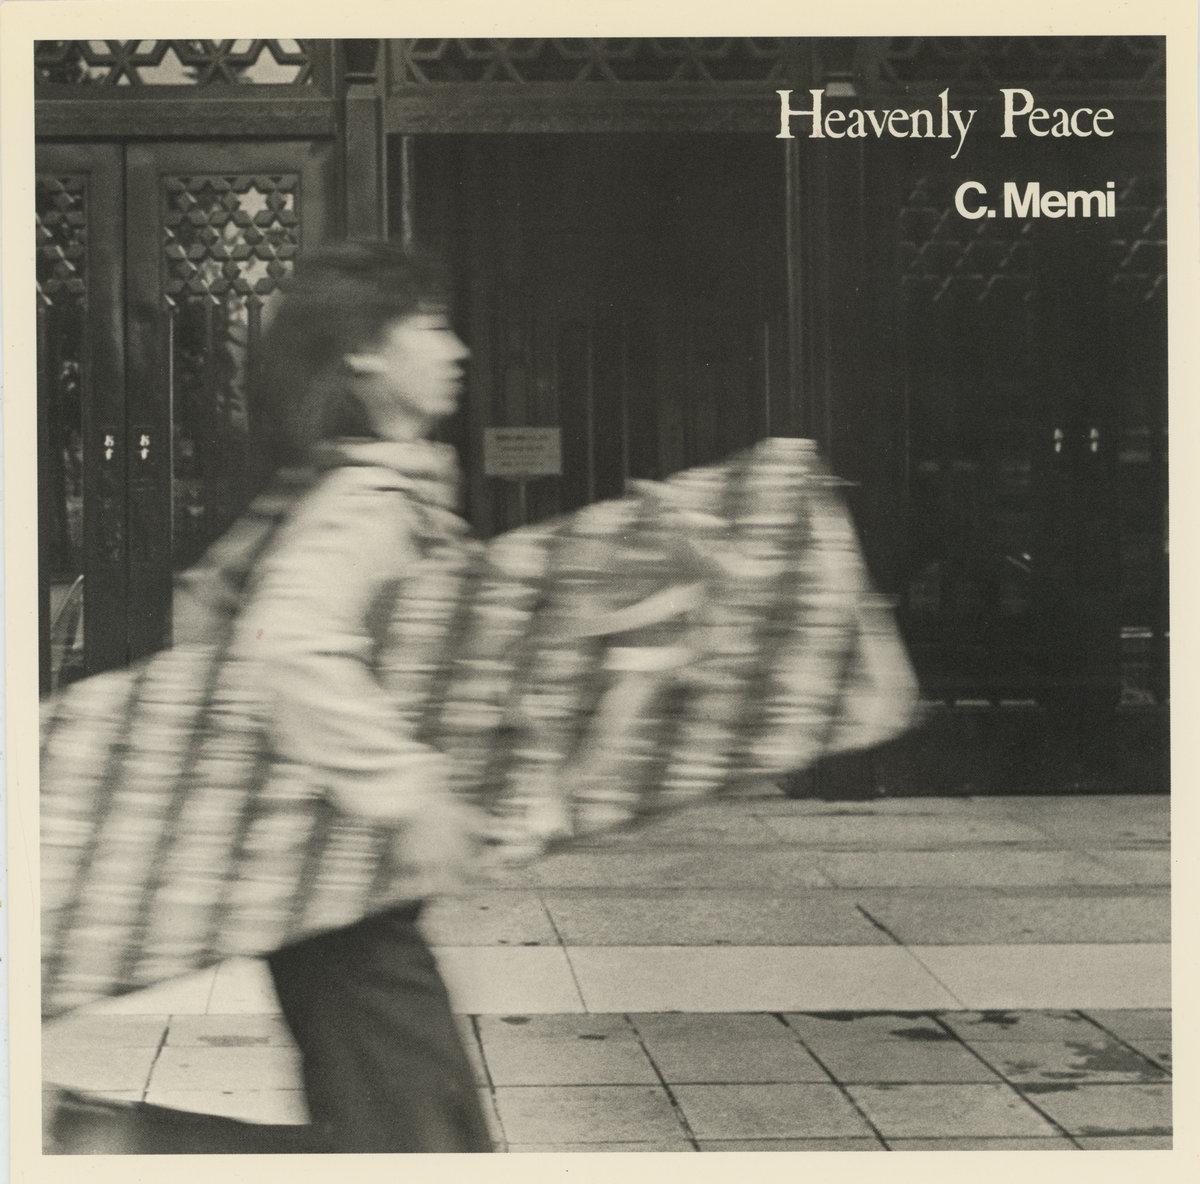 Heavenly Peace 12